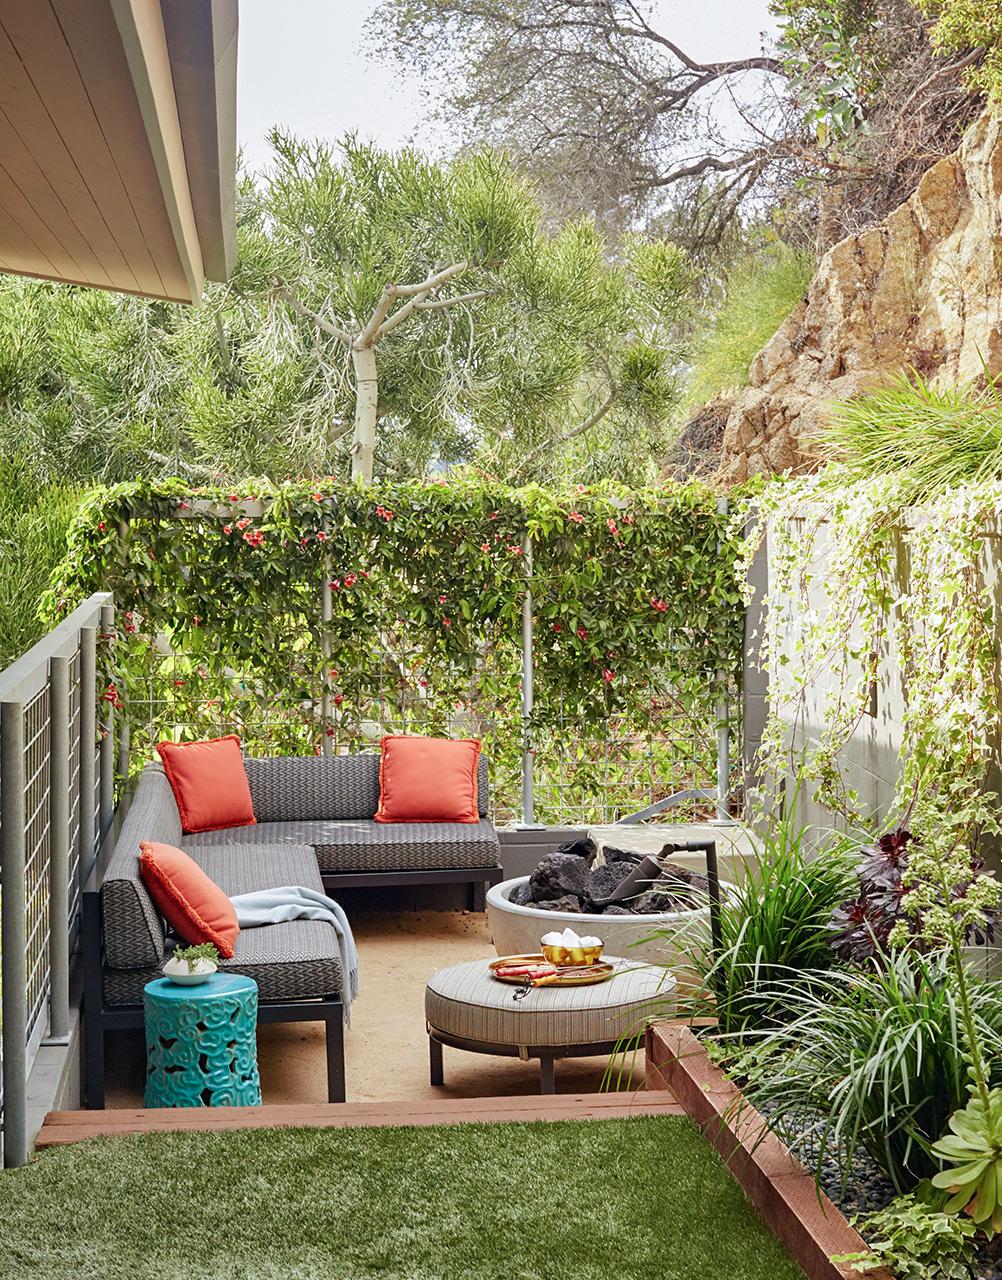 Beautiful Backyard Design Ideas On a Budget